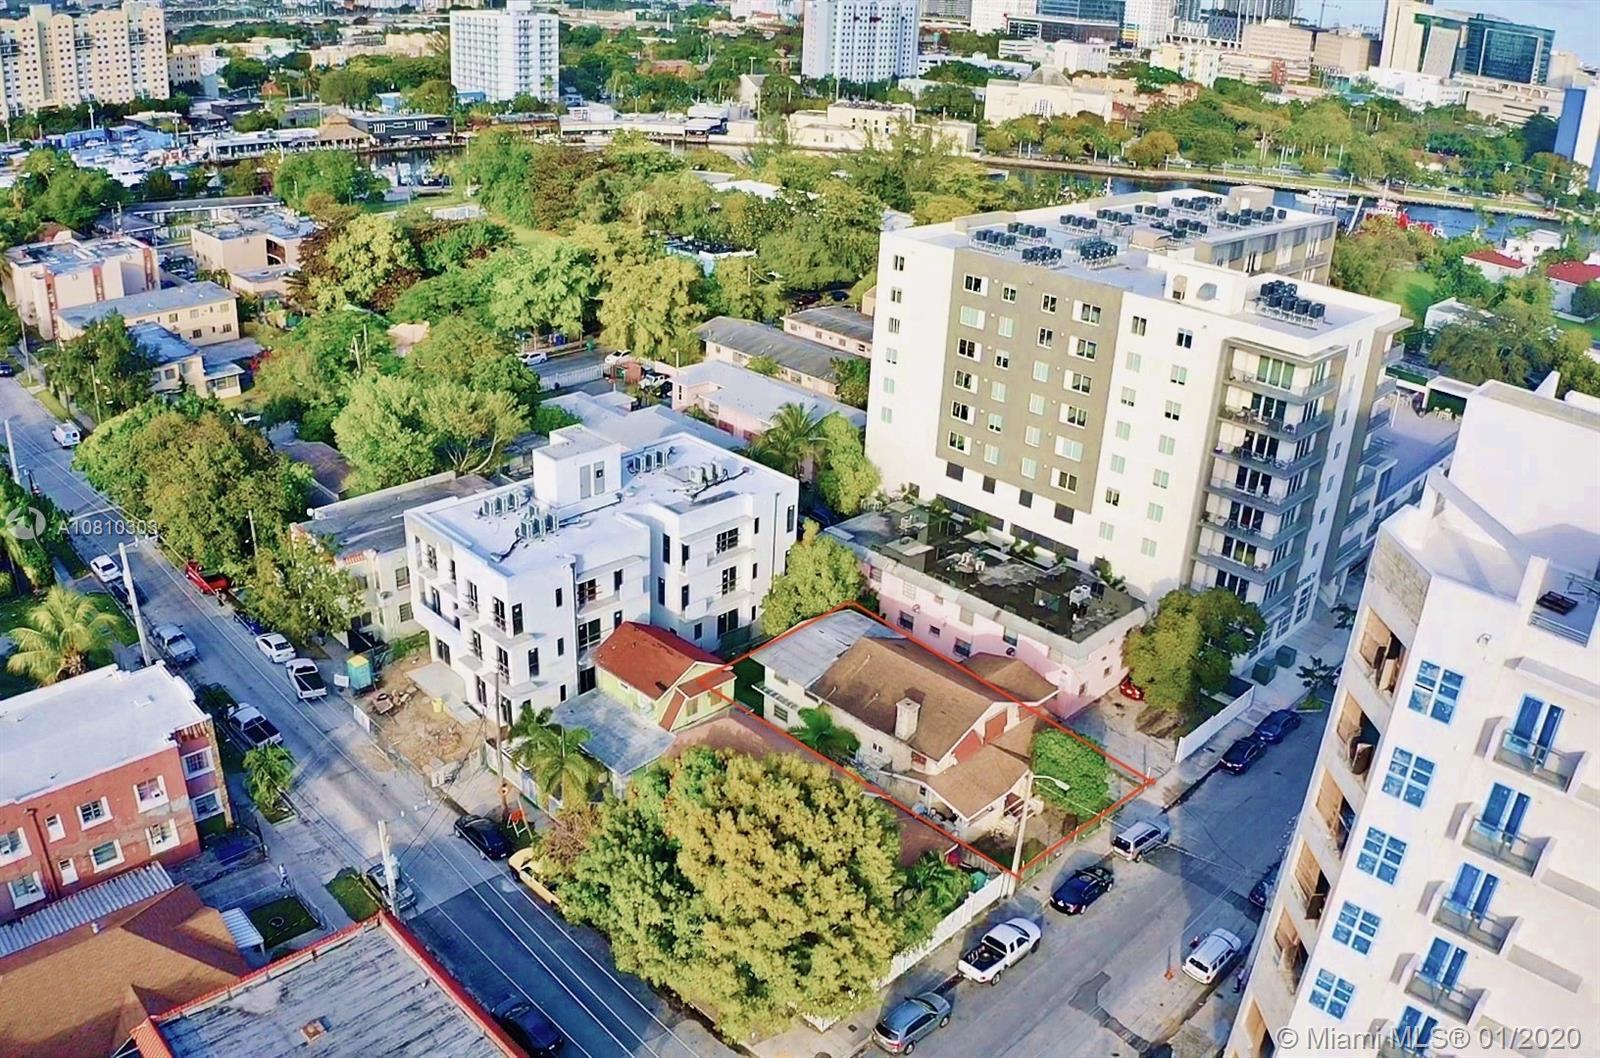 667 NW 1st St, Miami, FL 33128